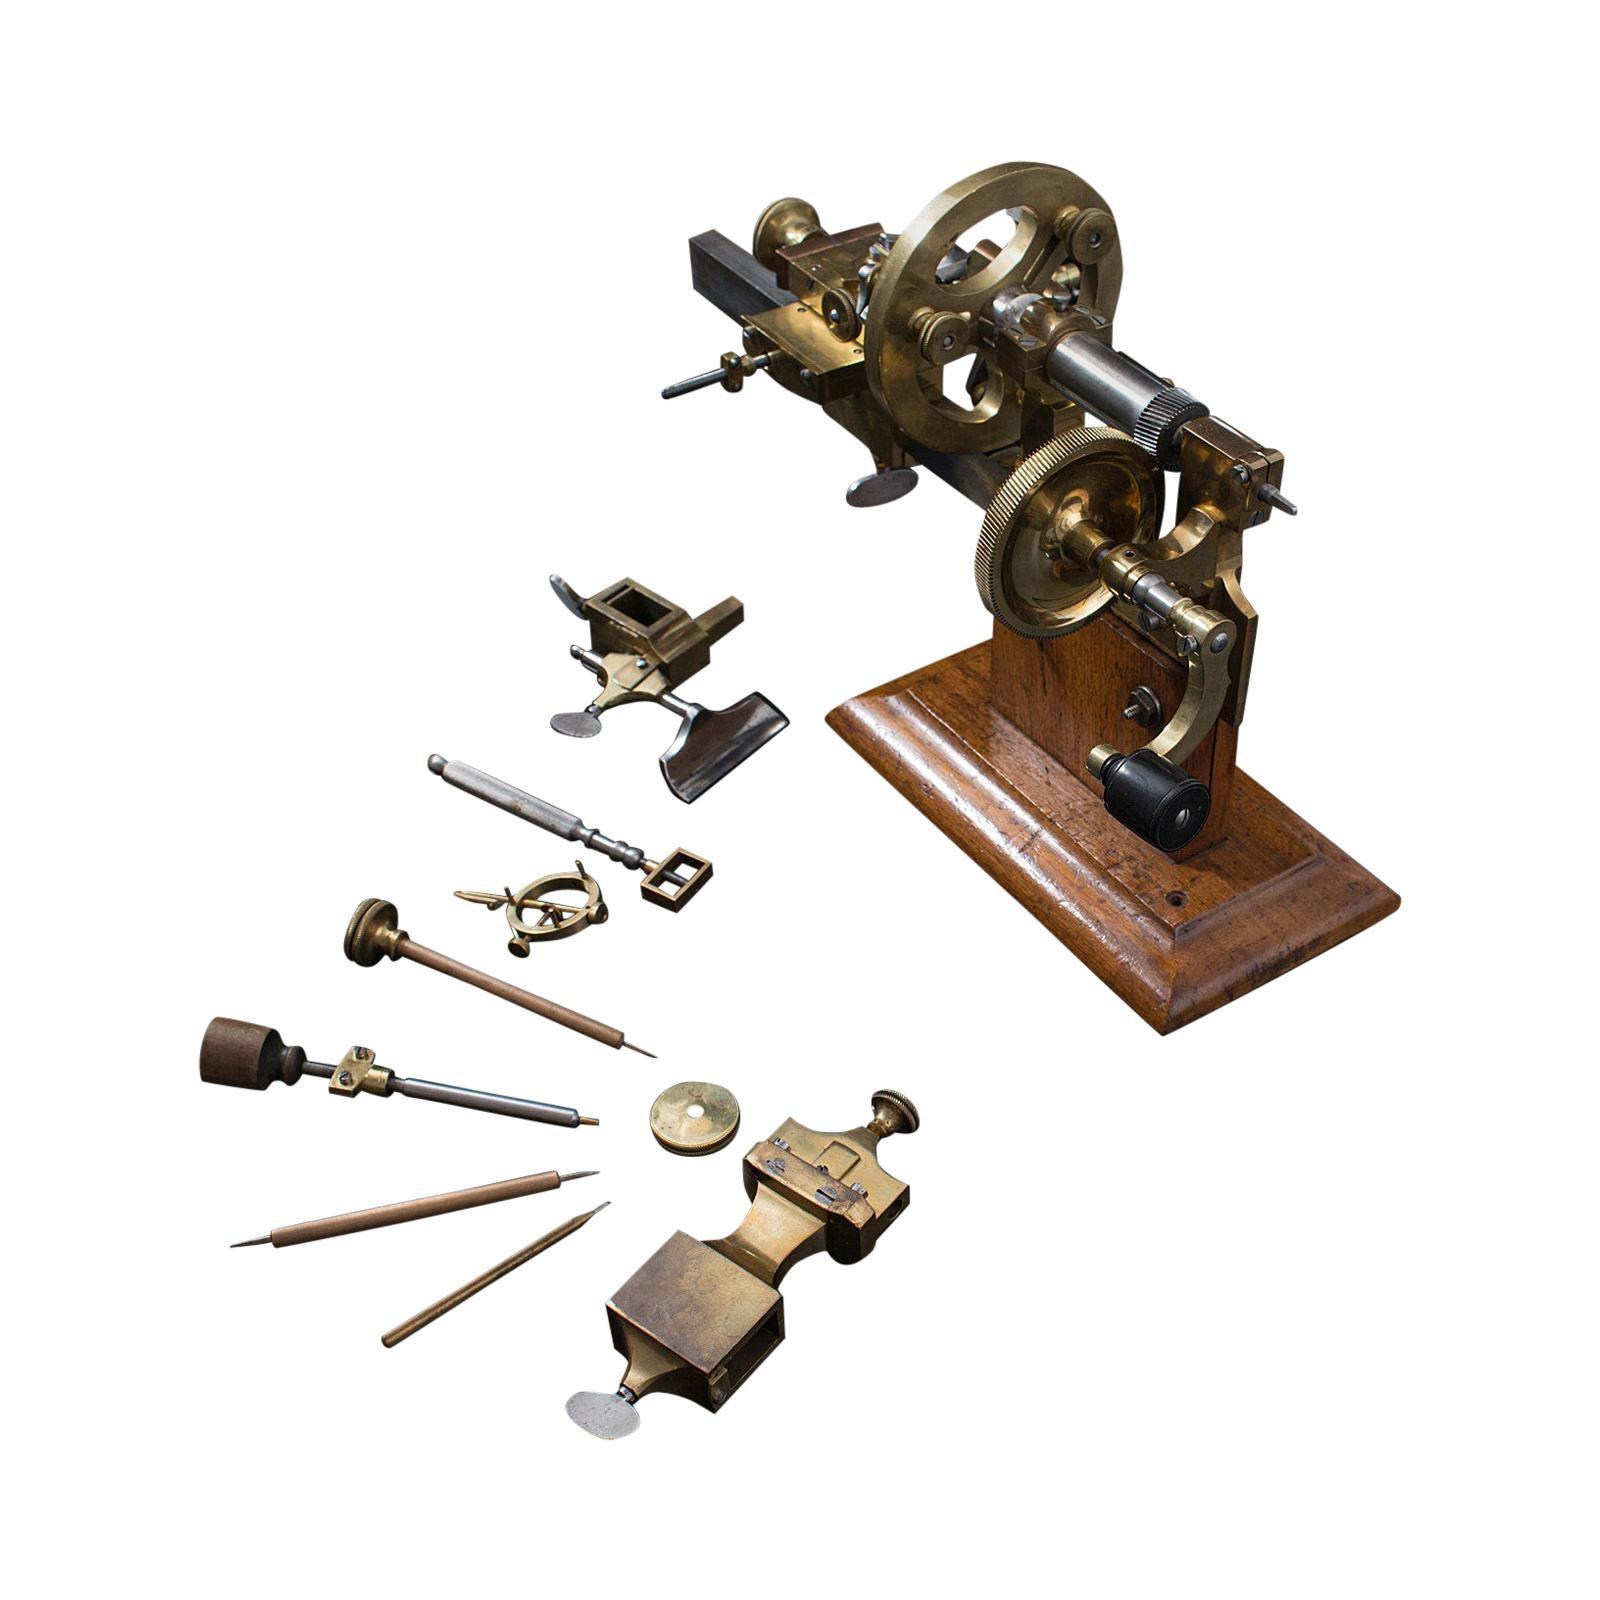 Antique Watchmaker's Lathe, Swiss, Brass, Copper Precision Instrument circa 1900